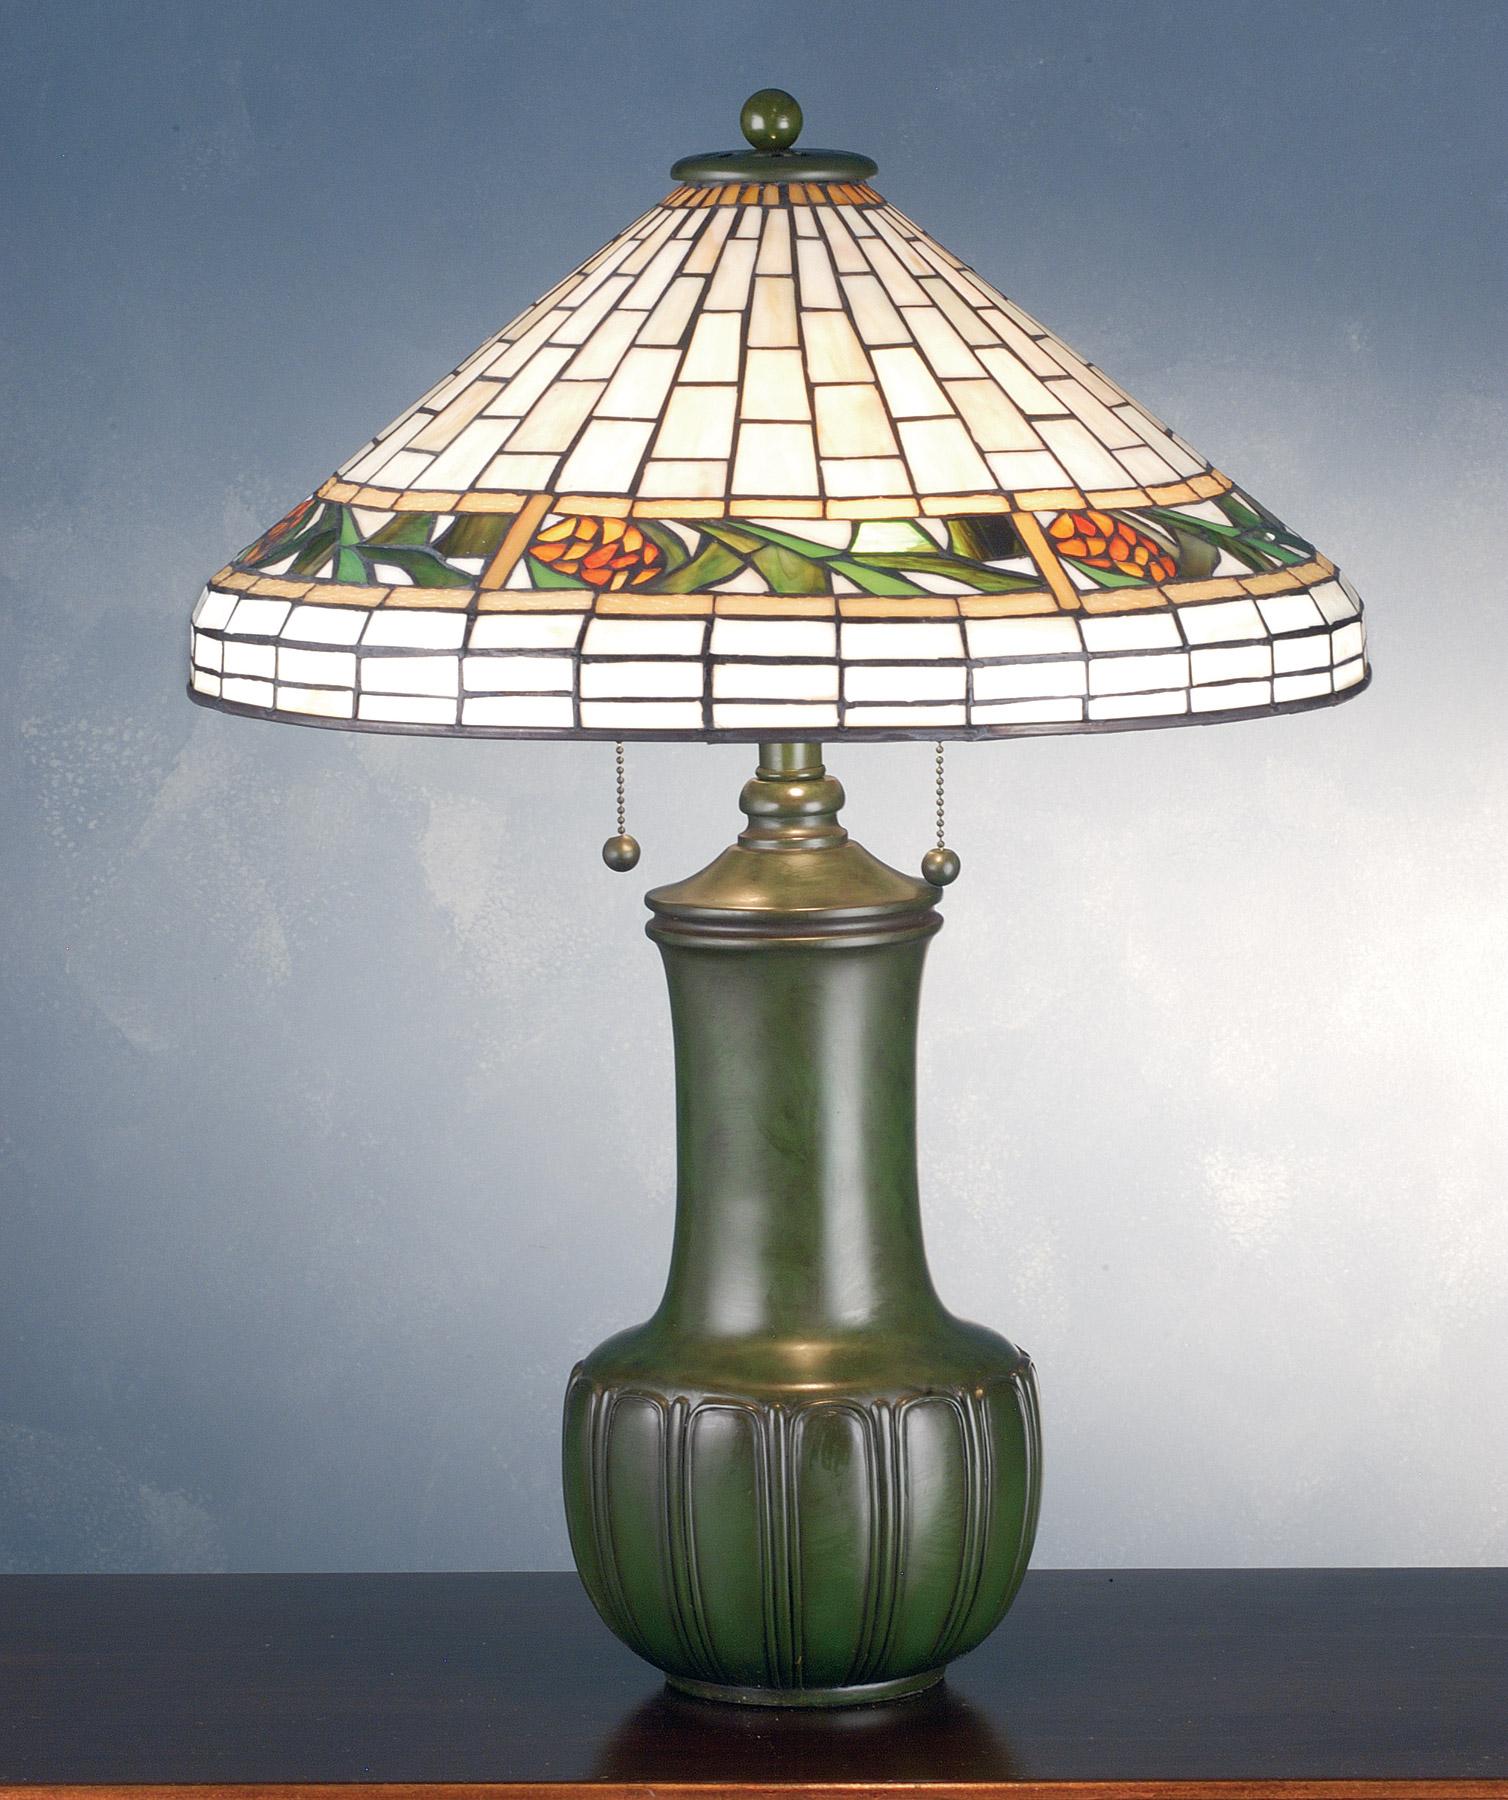 Meyda 71437 Bungalow Pine Cone Table Lamp